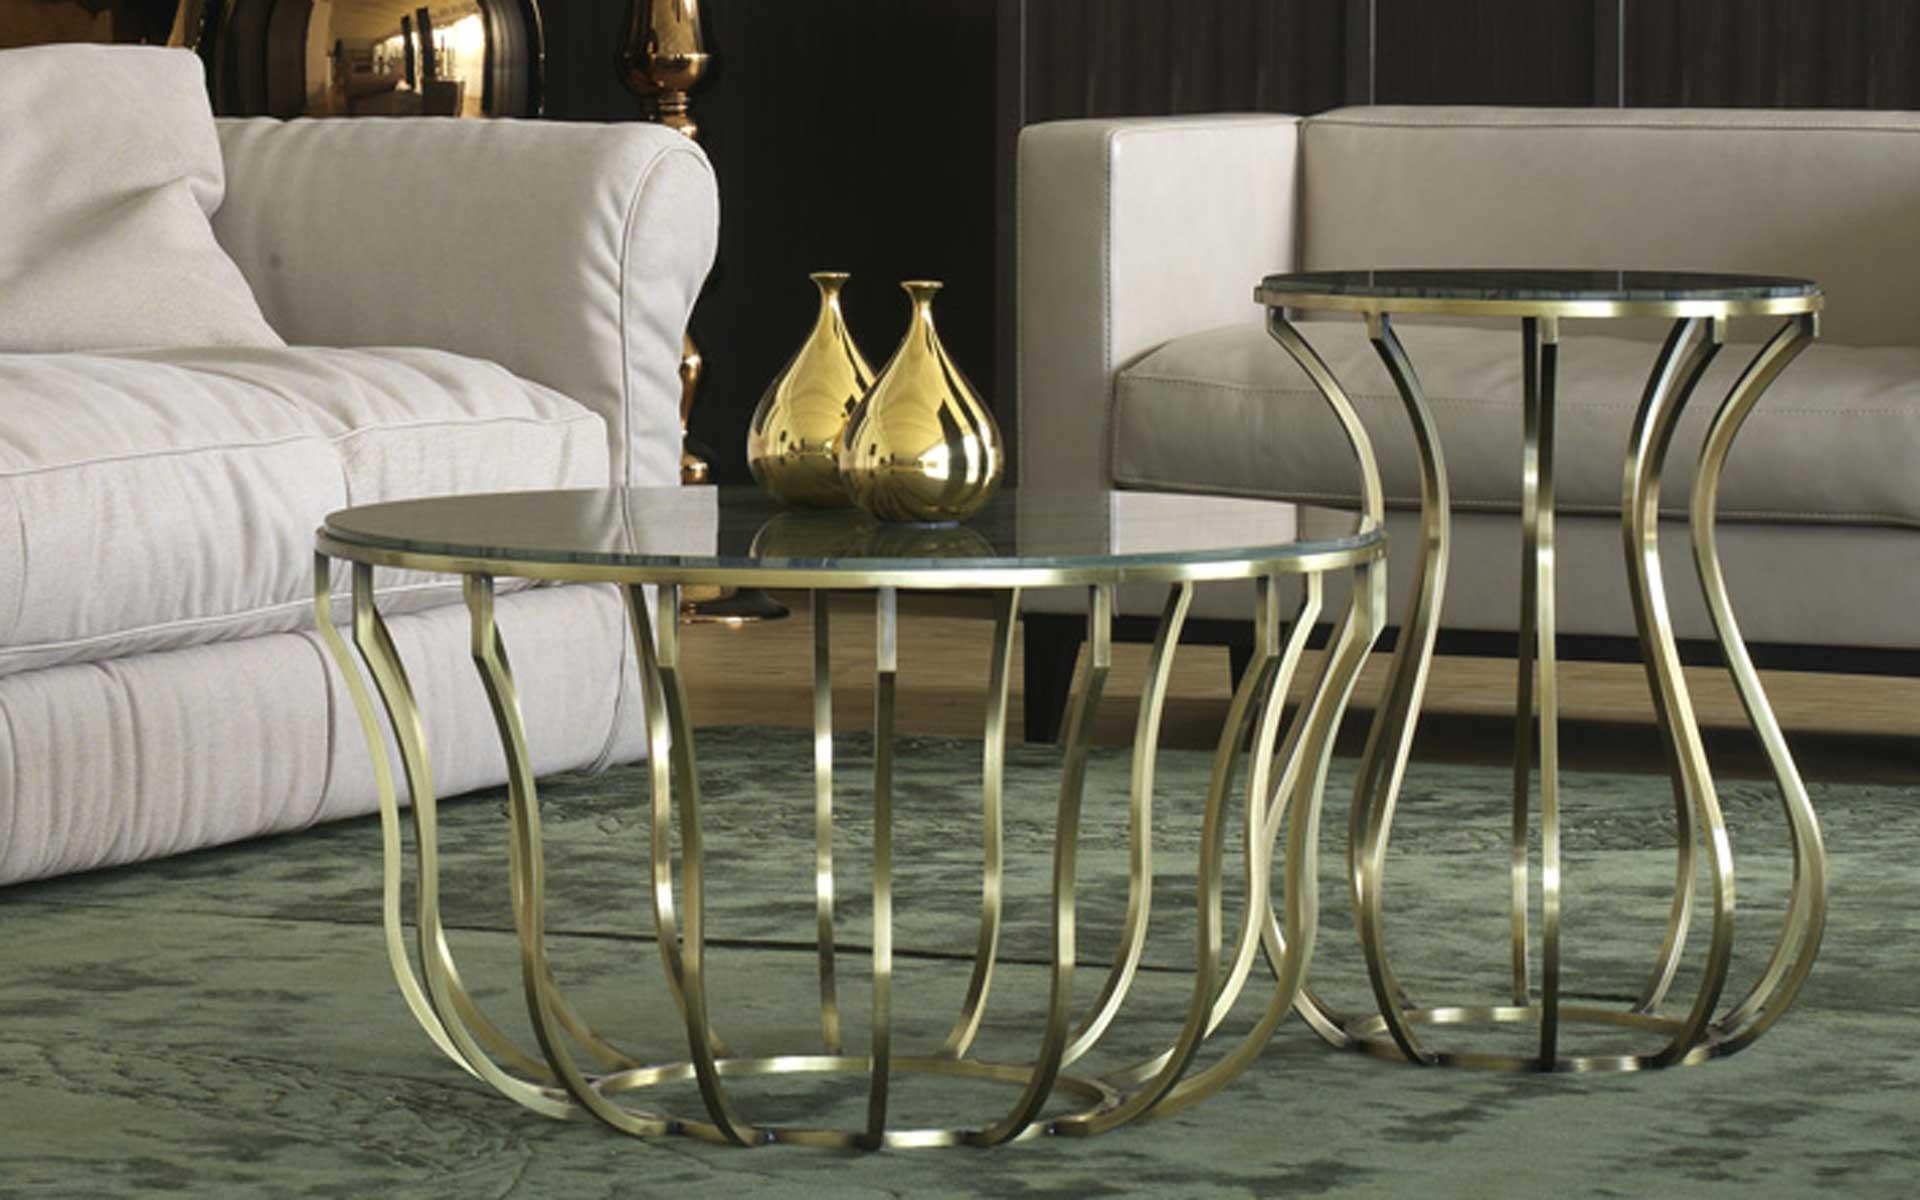 Tavolino Jules Baxter by Roberto Lazzeroni